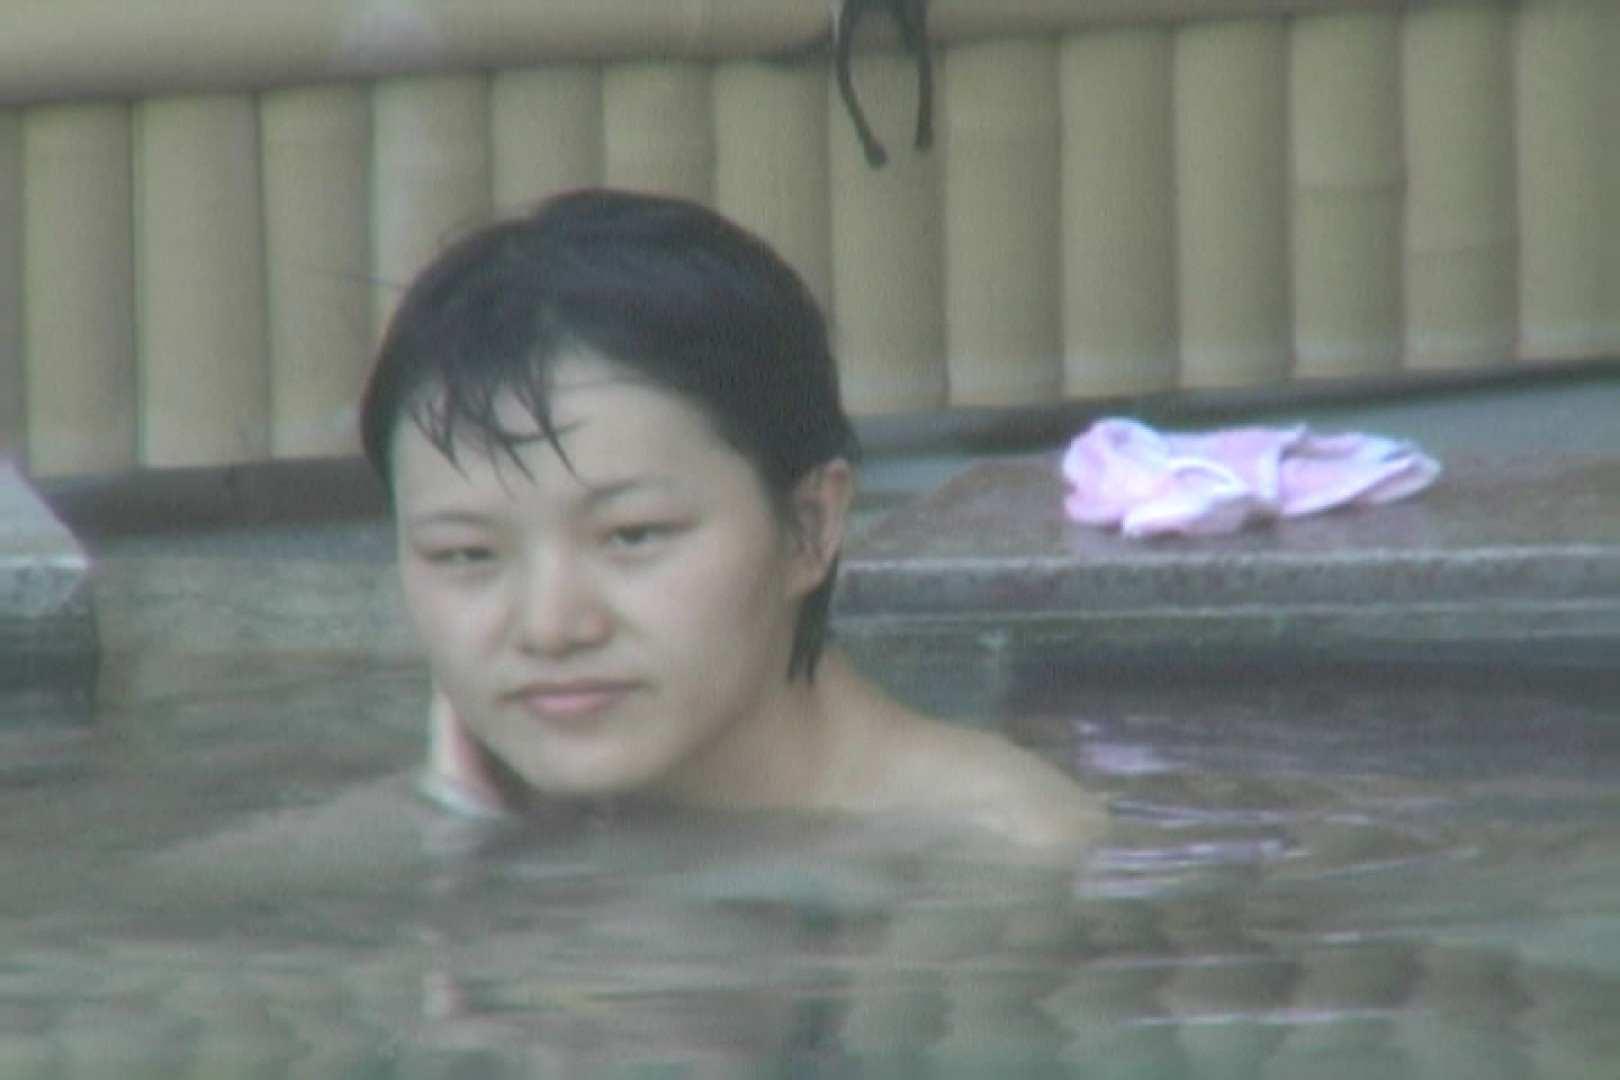 Aquaな露天風呂Vol.116 盗撮映像  42Pix 28